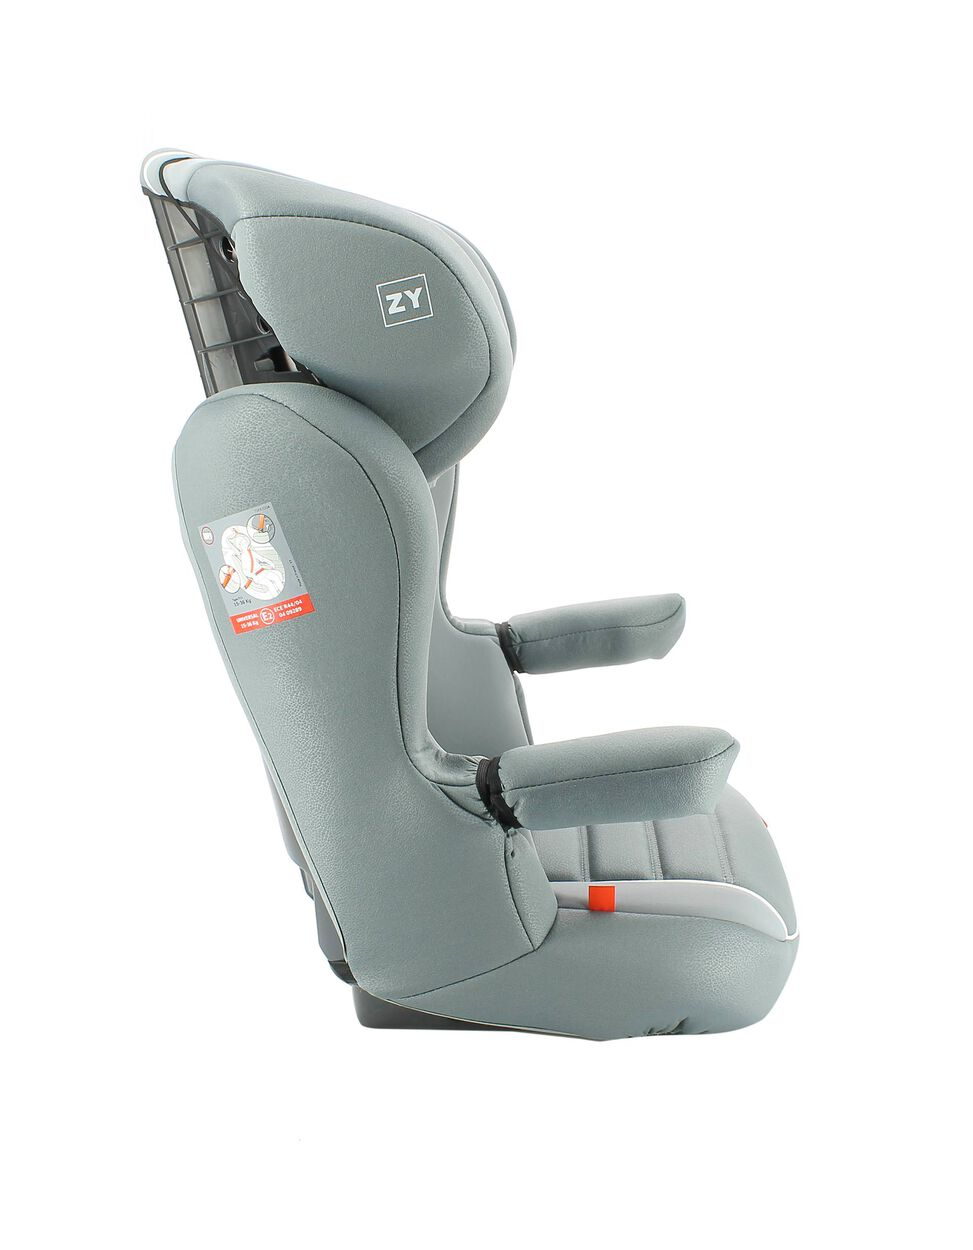 Cadeira Auto Gr 2/3 Primecare Prestige Zy Safe Grey